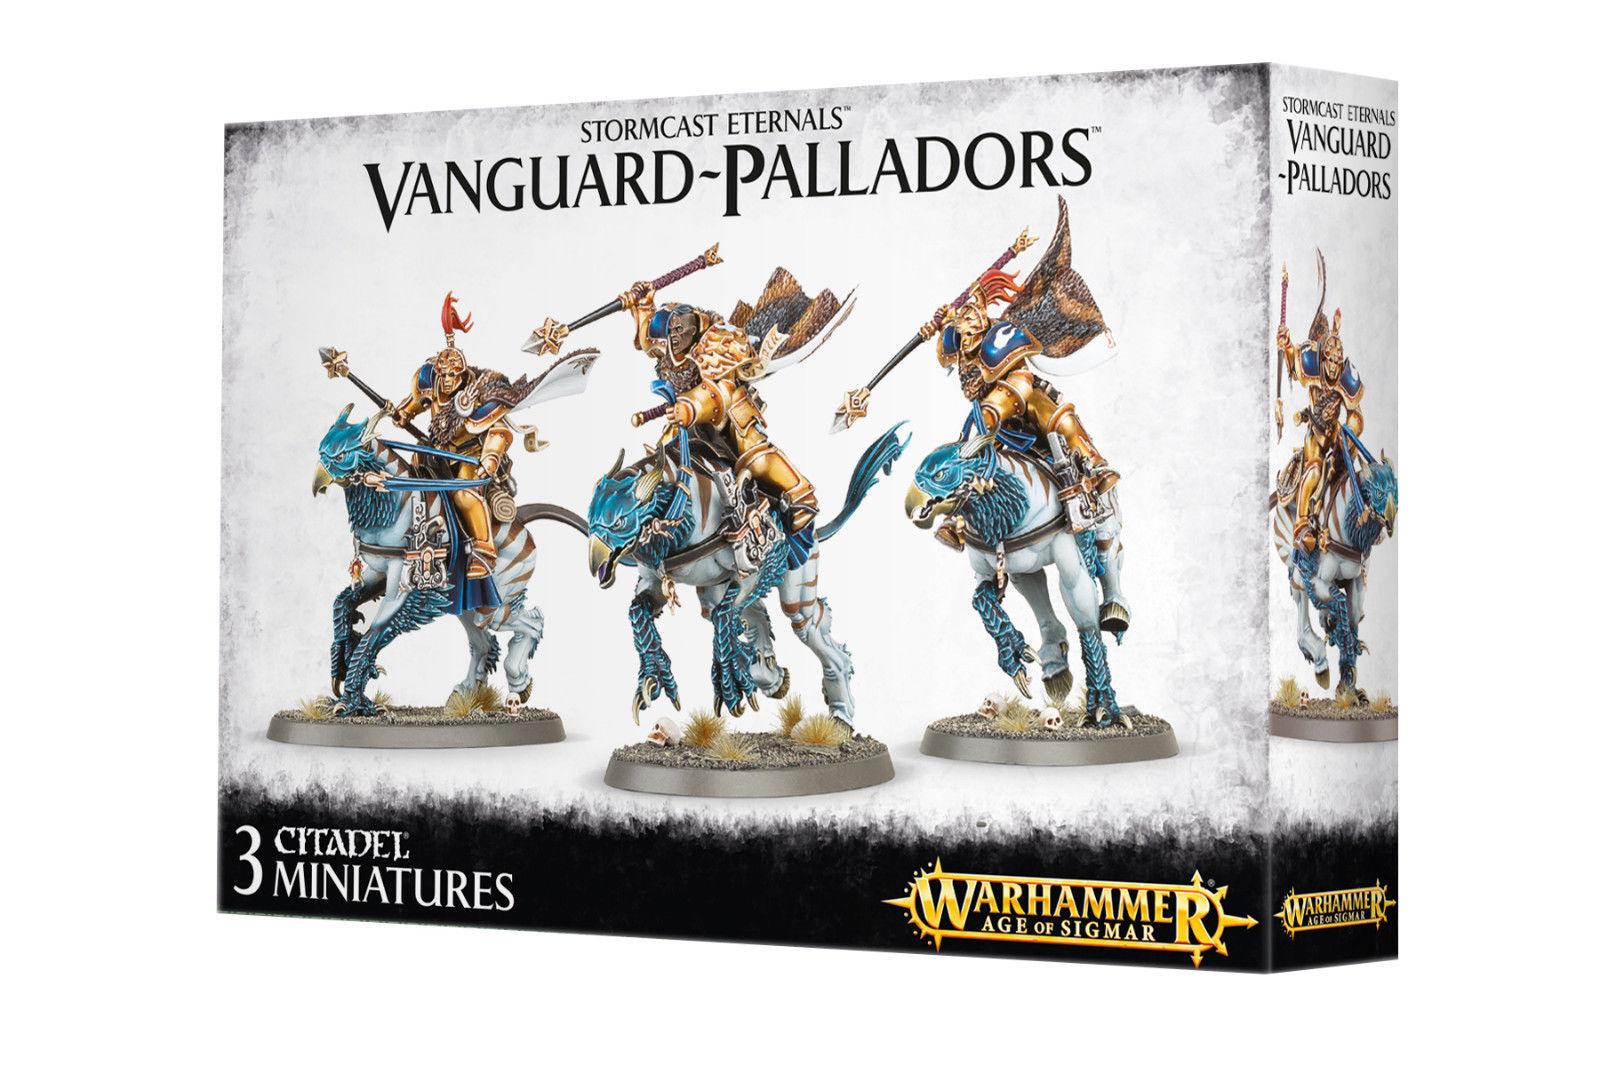 Stormcast Eternals Vanguard-Palladors Warhammer Fantasy Age of Sigmar NEW